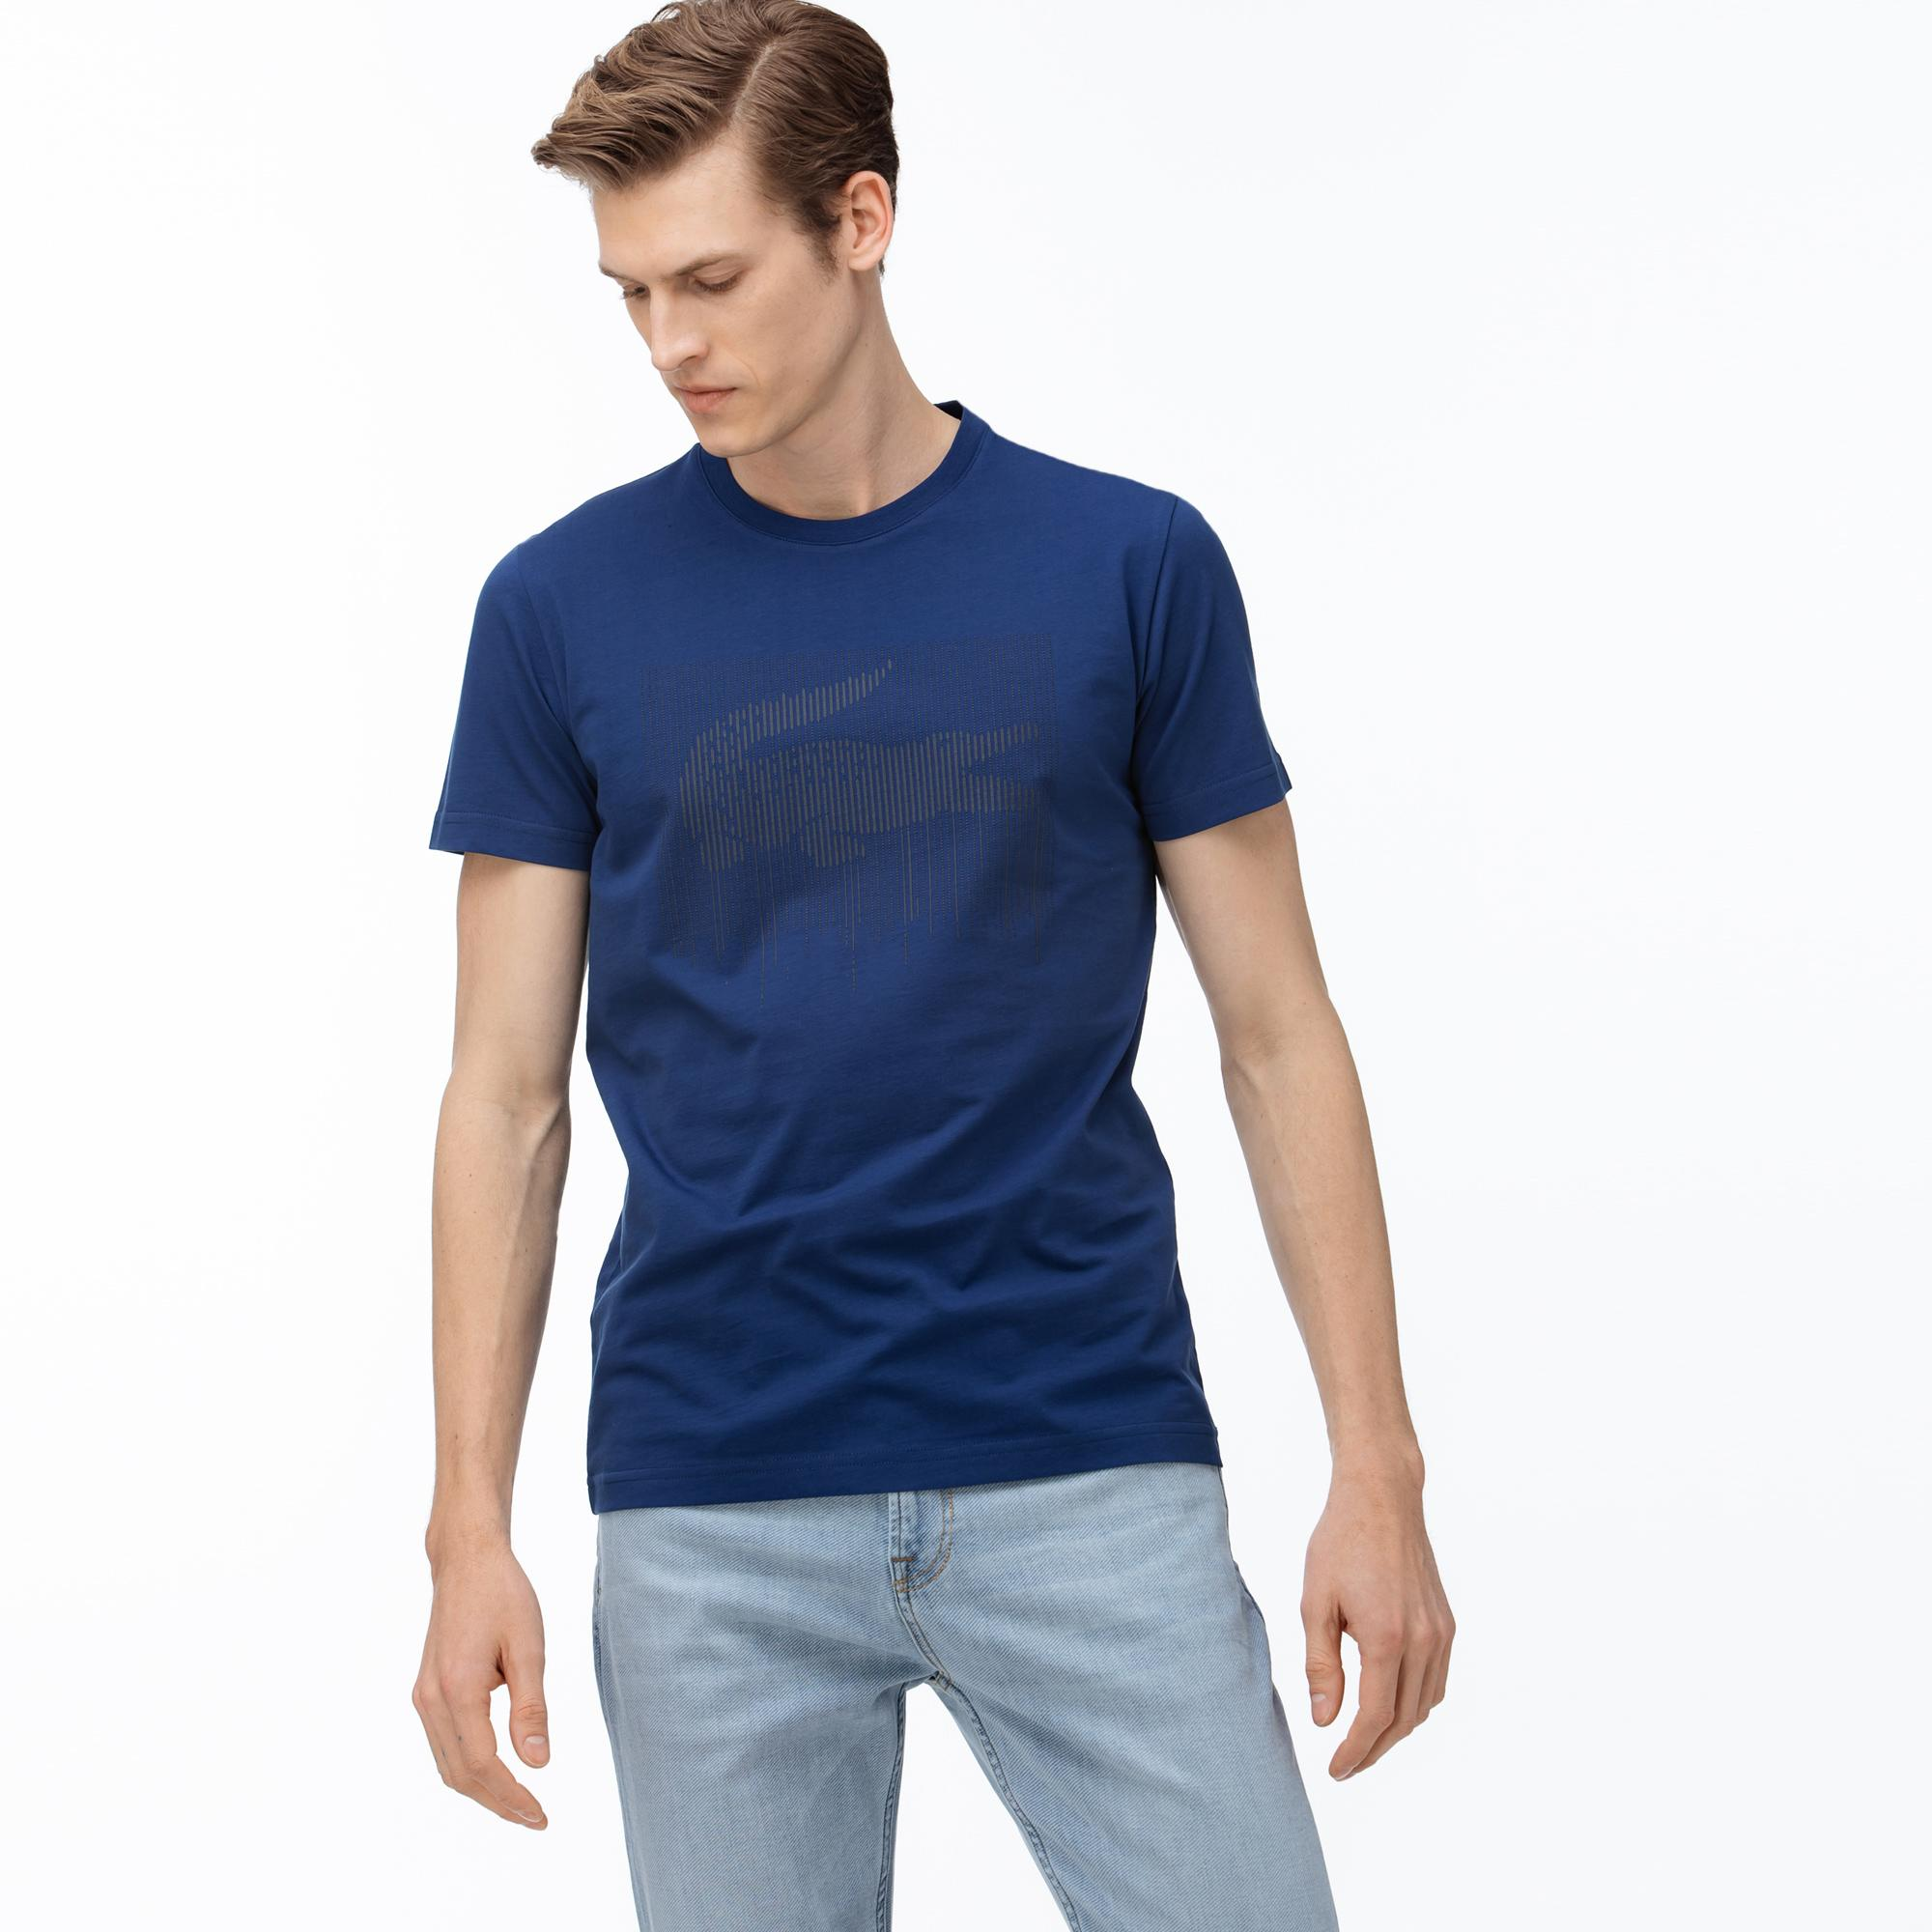 Lacoste Erkek Bisiklet Yaka Timsah Baskılı Saks Mavi T-Shirt